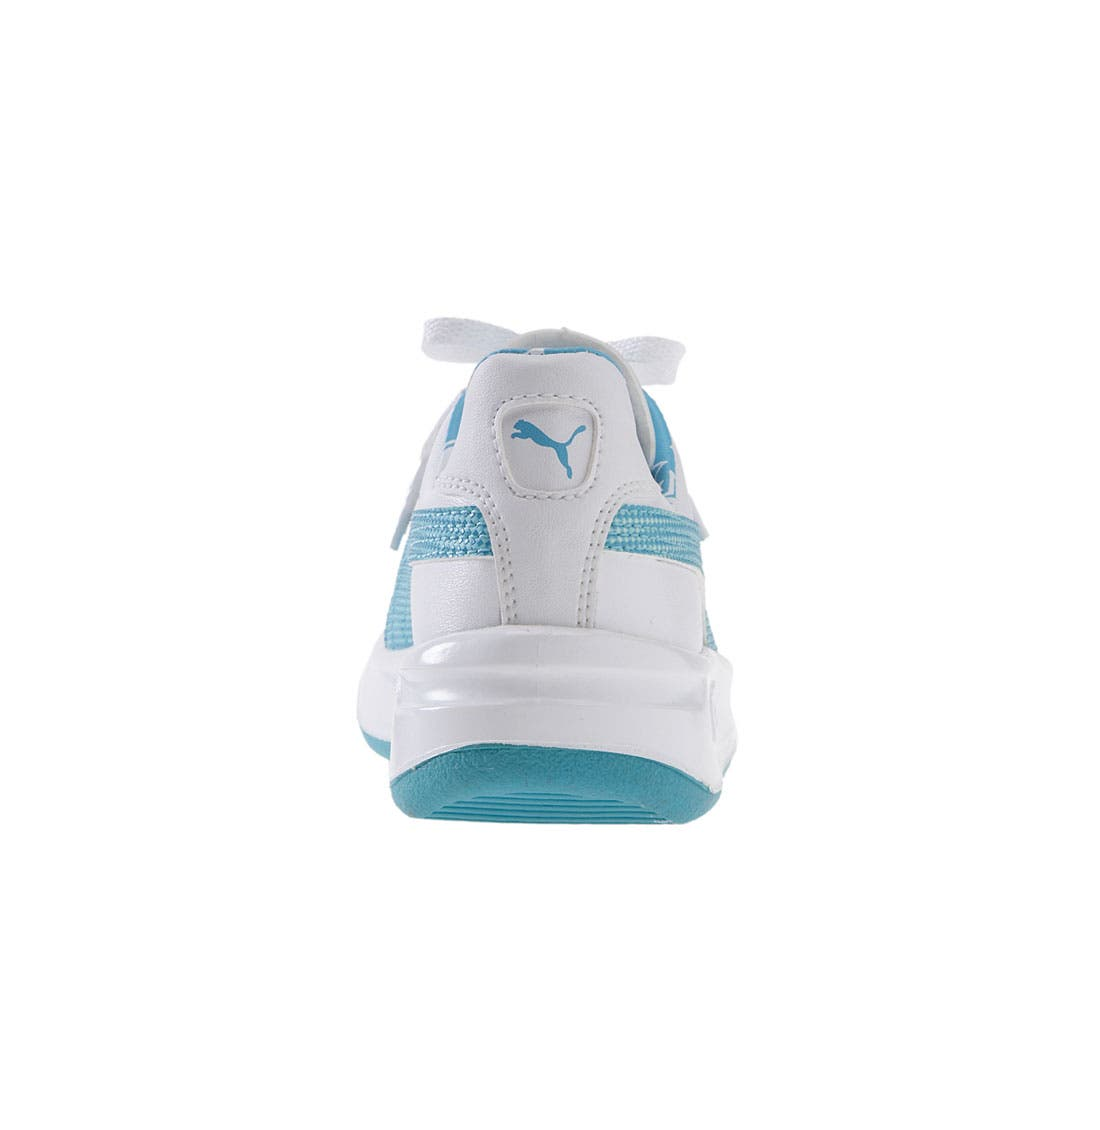 Alternate Image 3  - Puma 'GV Glow' Sneaker (Baby, Walker, Toddler & Little Kid) (Nordstrom Exclusive)